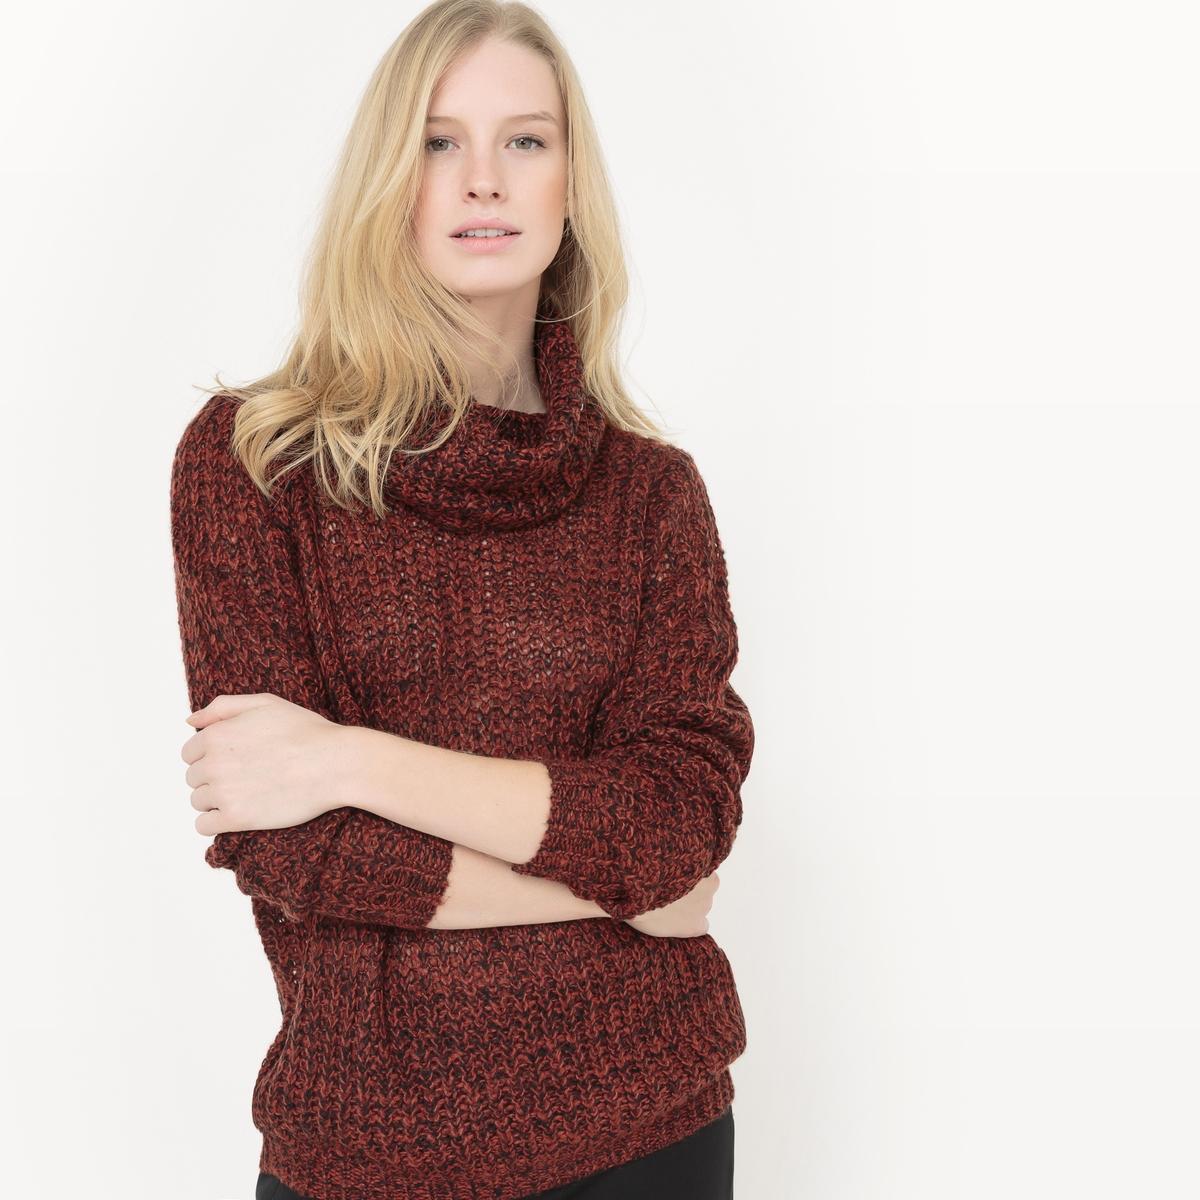 Пуловер MIMEI PULLСостав и описание :Материал : 100% акрилМарка : B.YOUNG<br><br>Цвет: бордовый